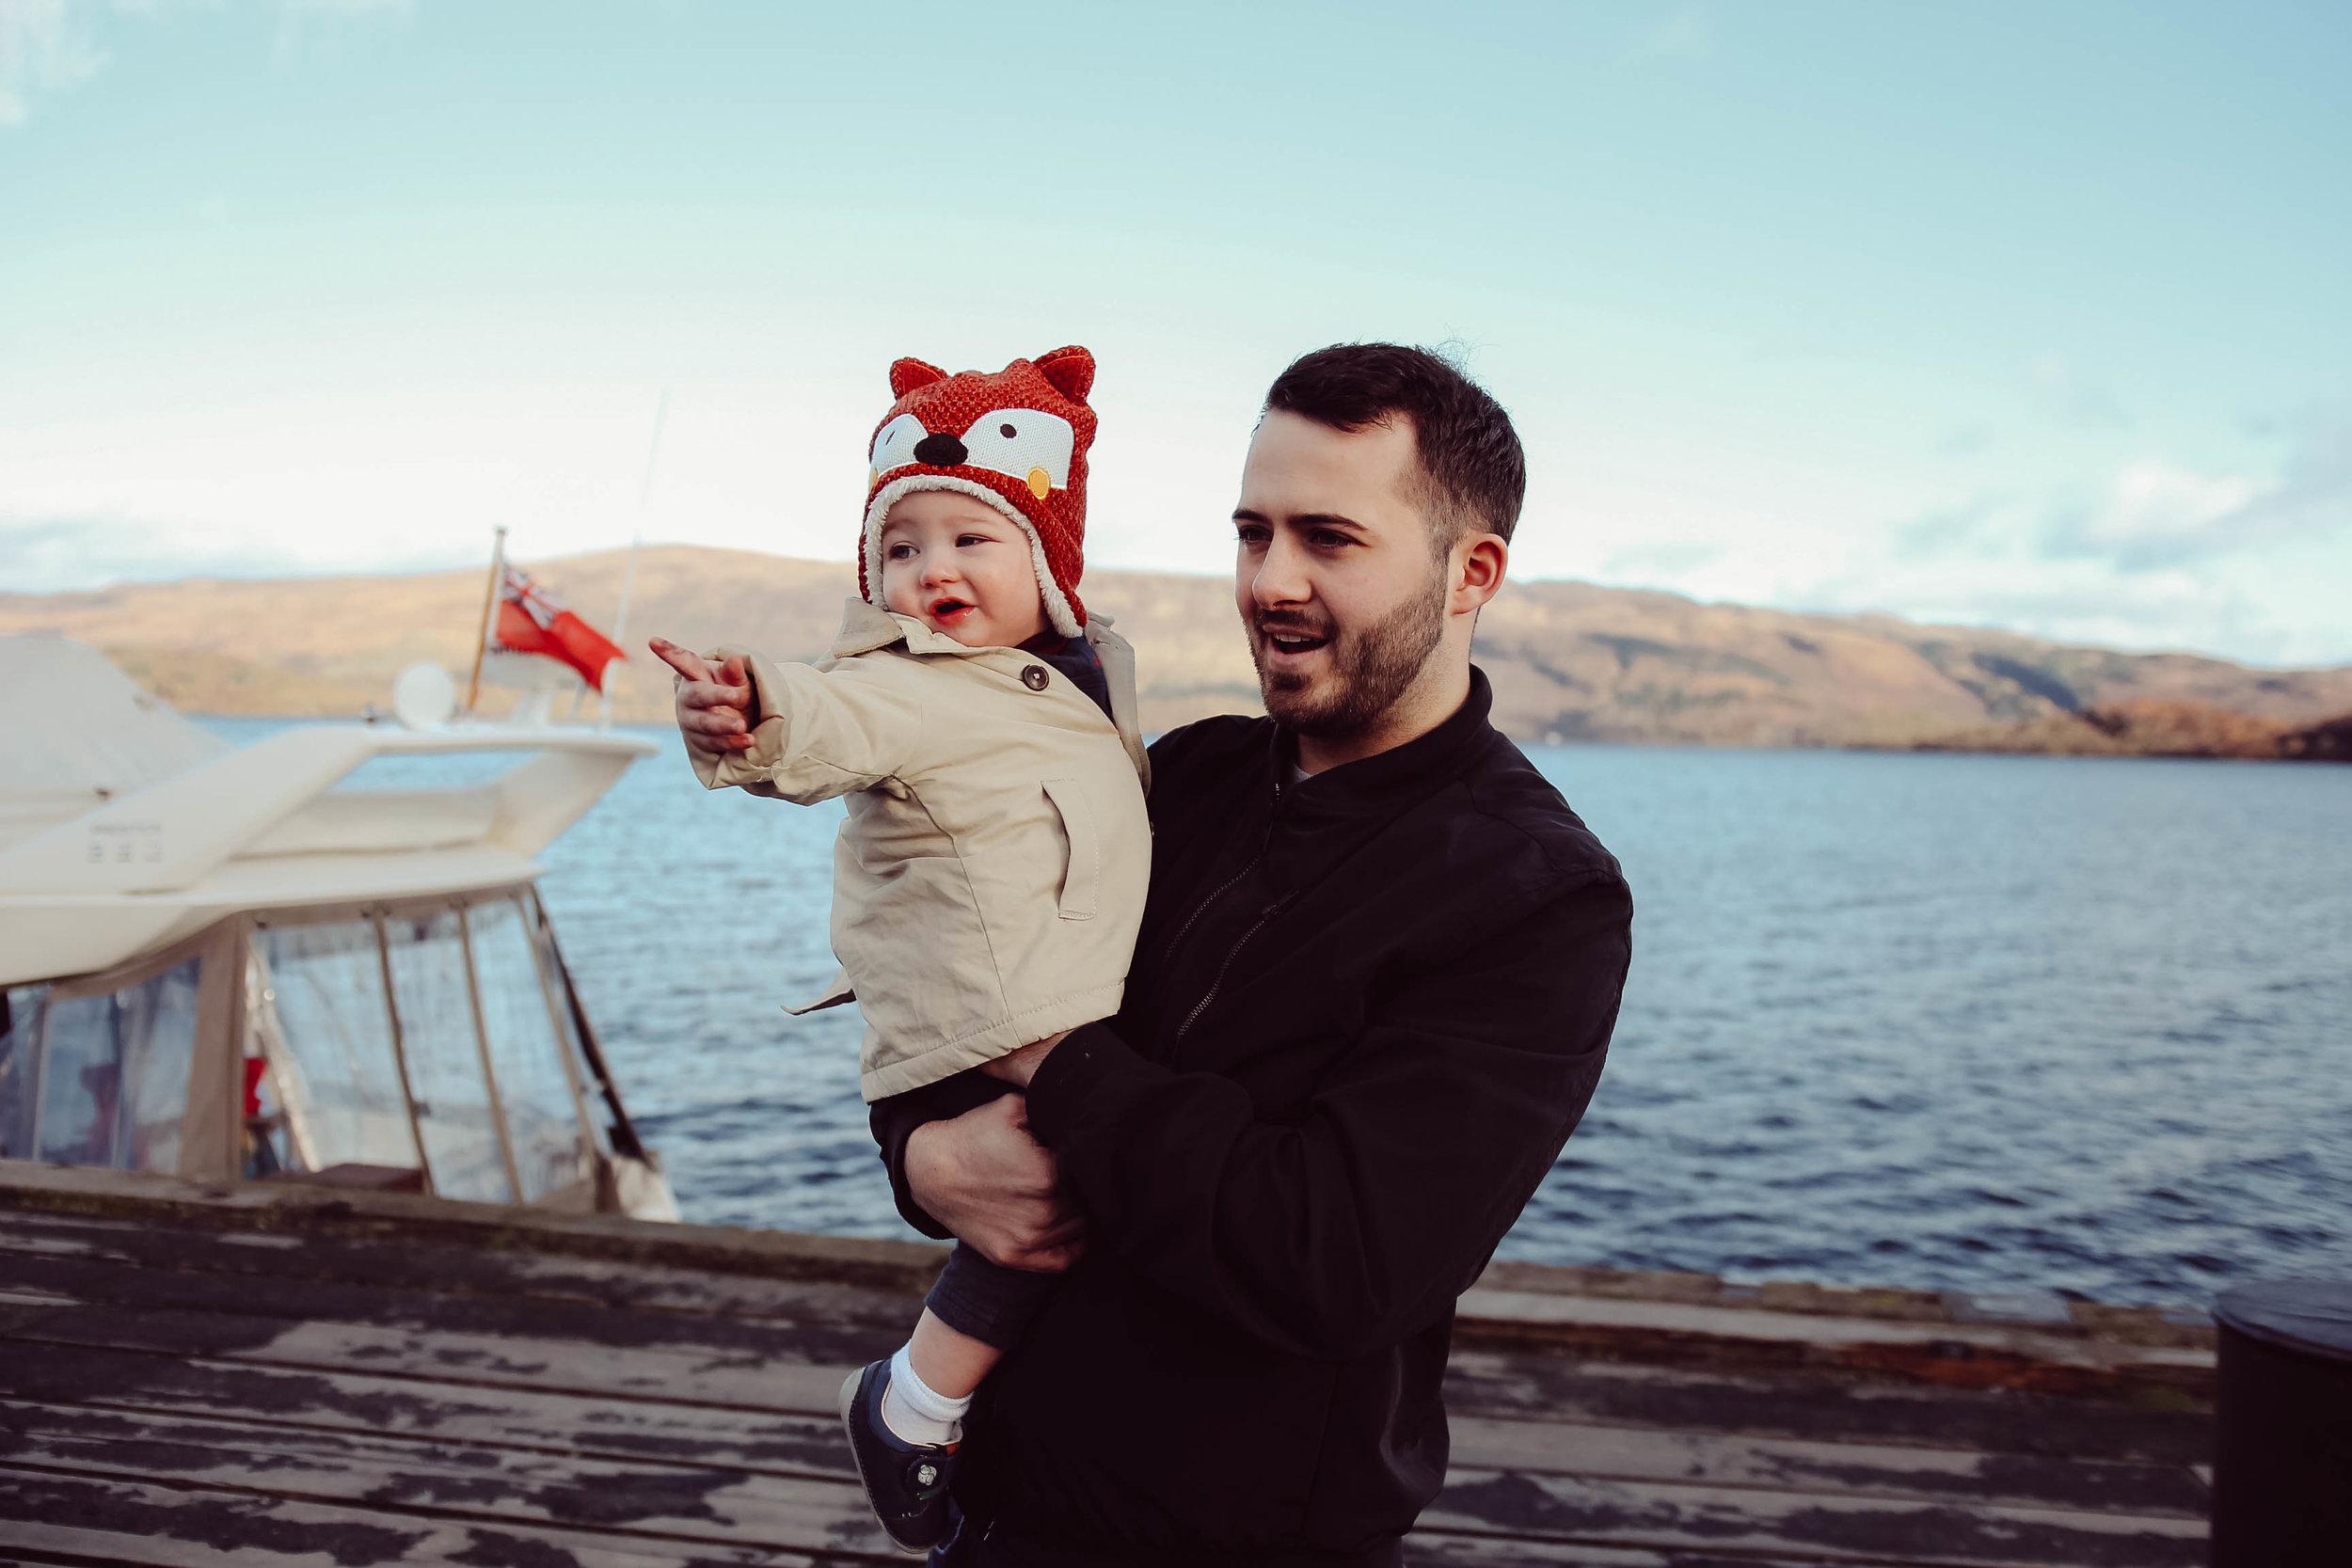 Loch lomond with a toddler